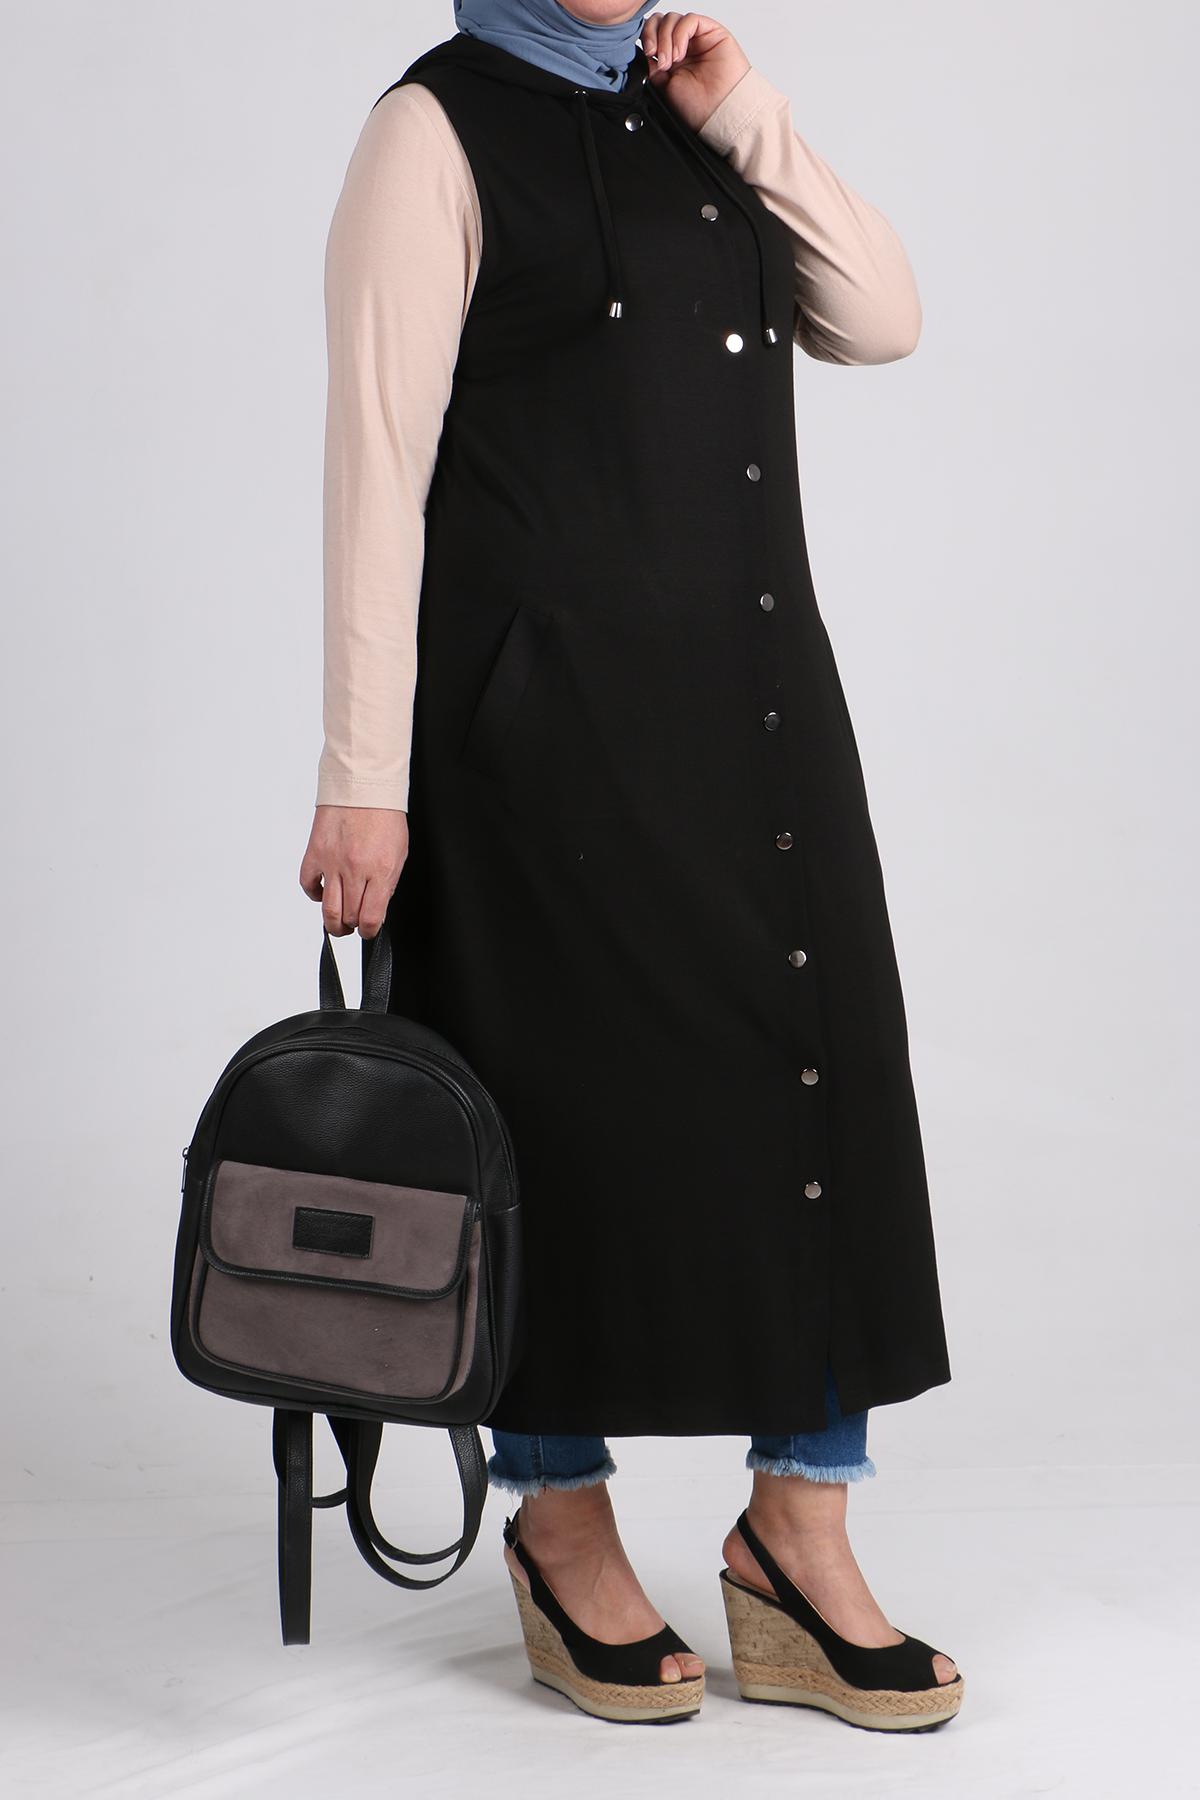 4051 Plus Size Snap Fastener Vest - Black